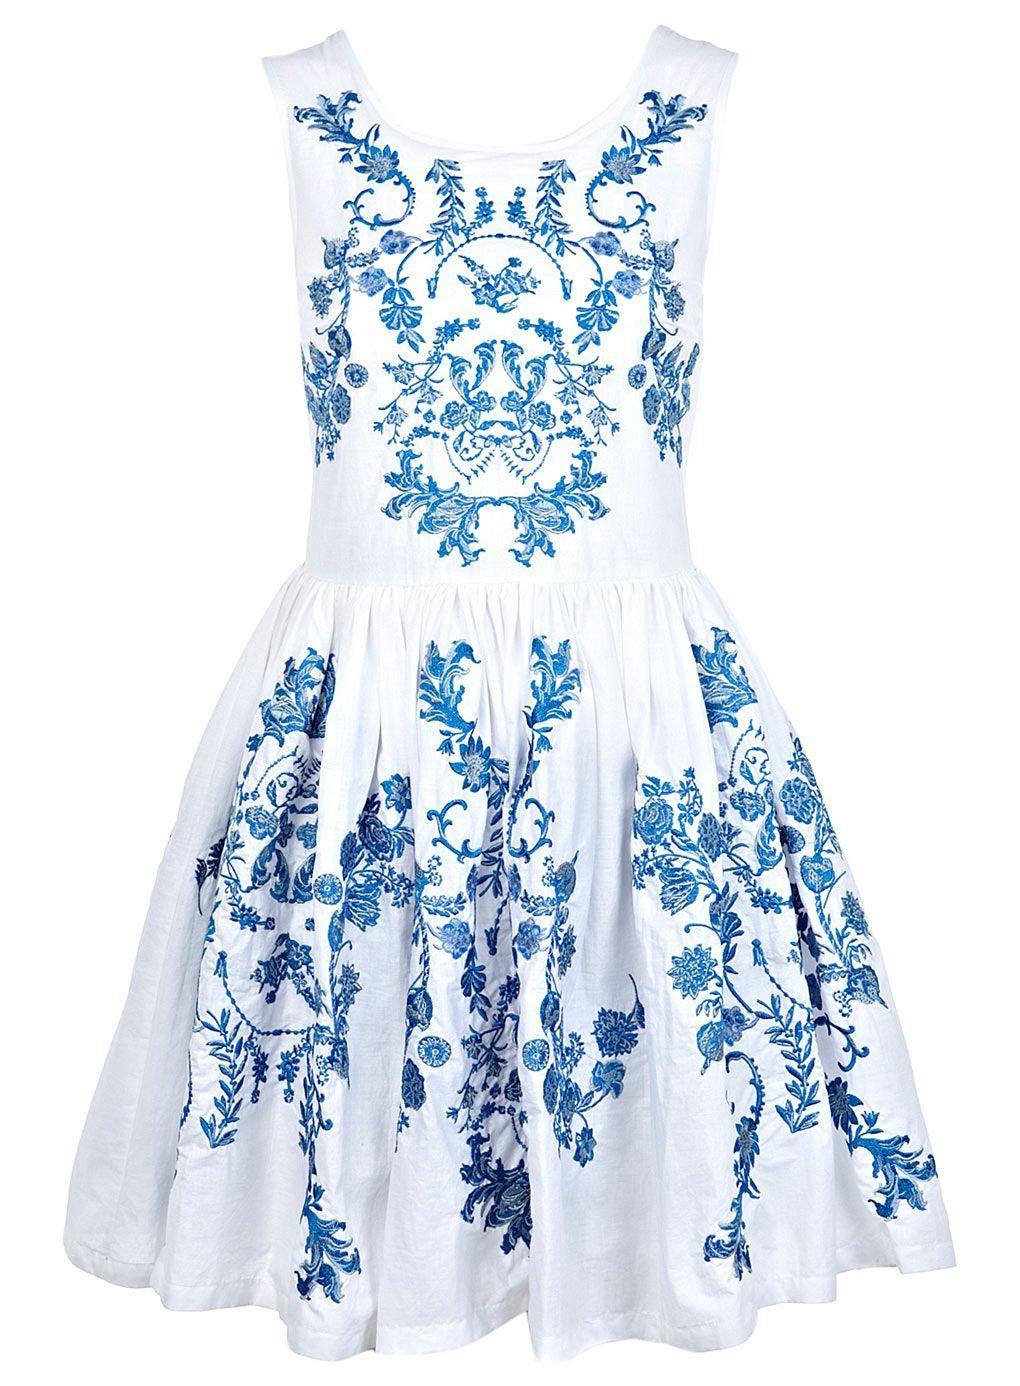 China Blue Embroidered Dress - Prom Dresses - Dress Shop - Miss ...